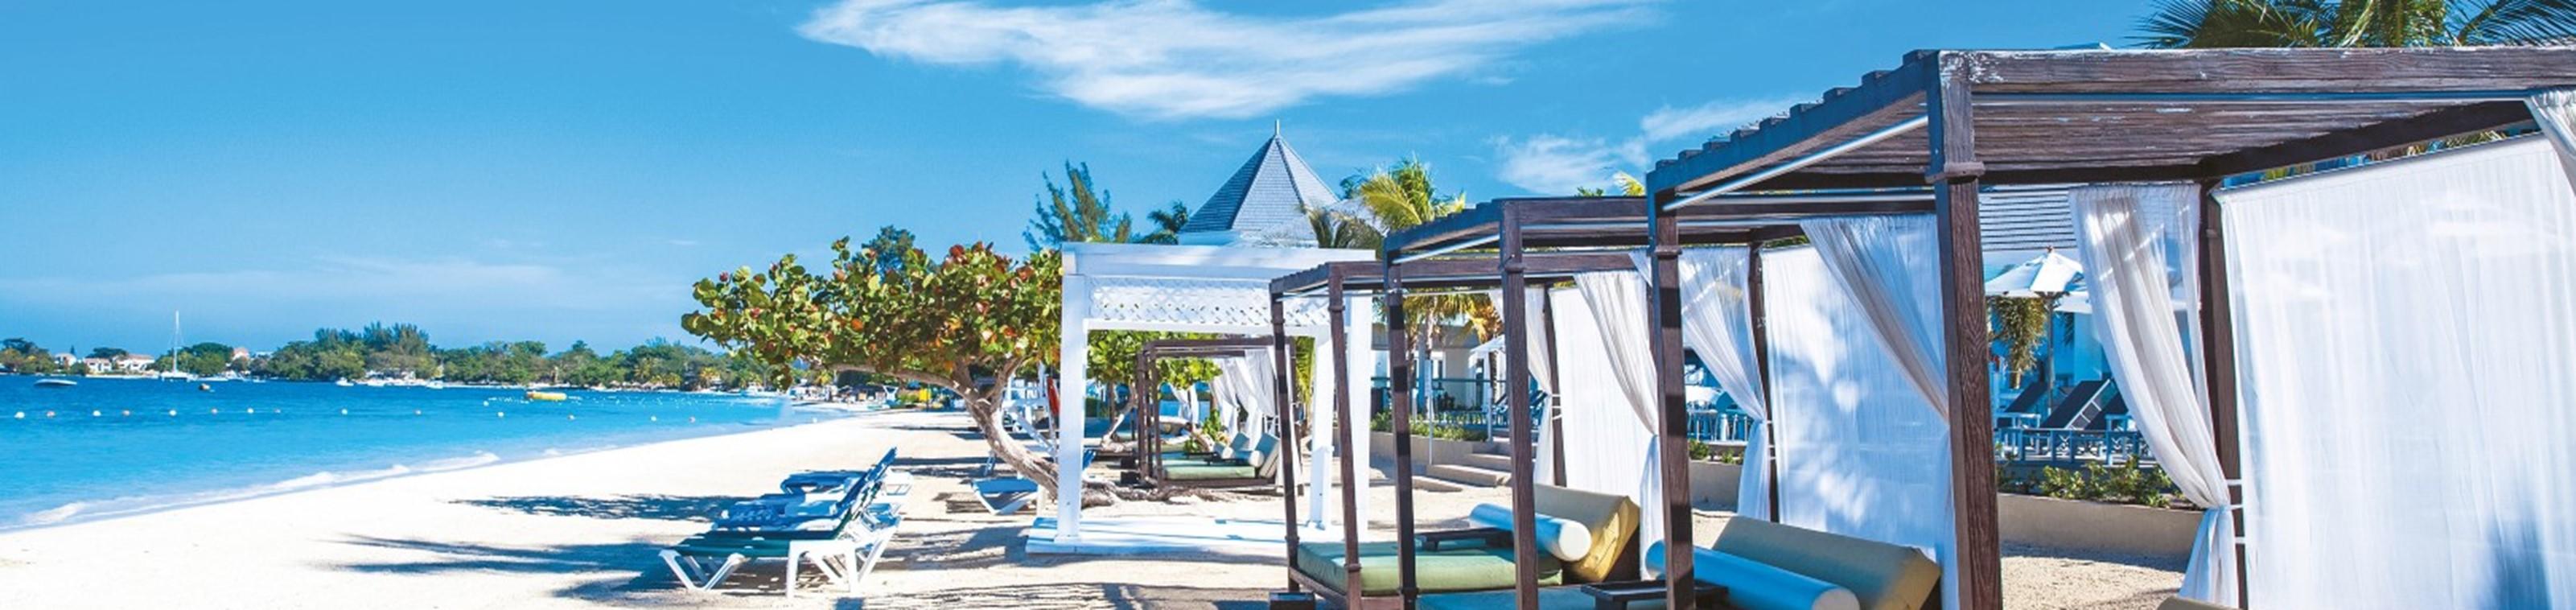 TUI SENSATORI Resort, Negril